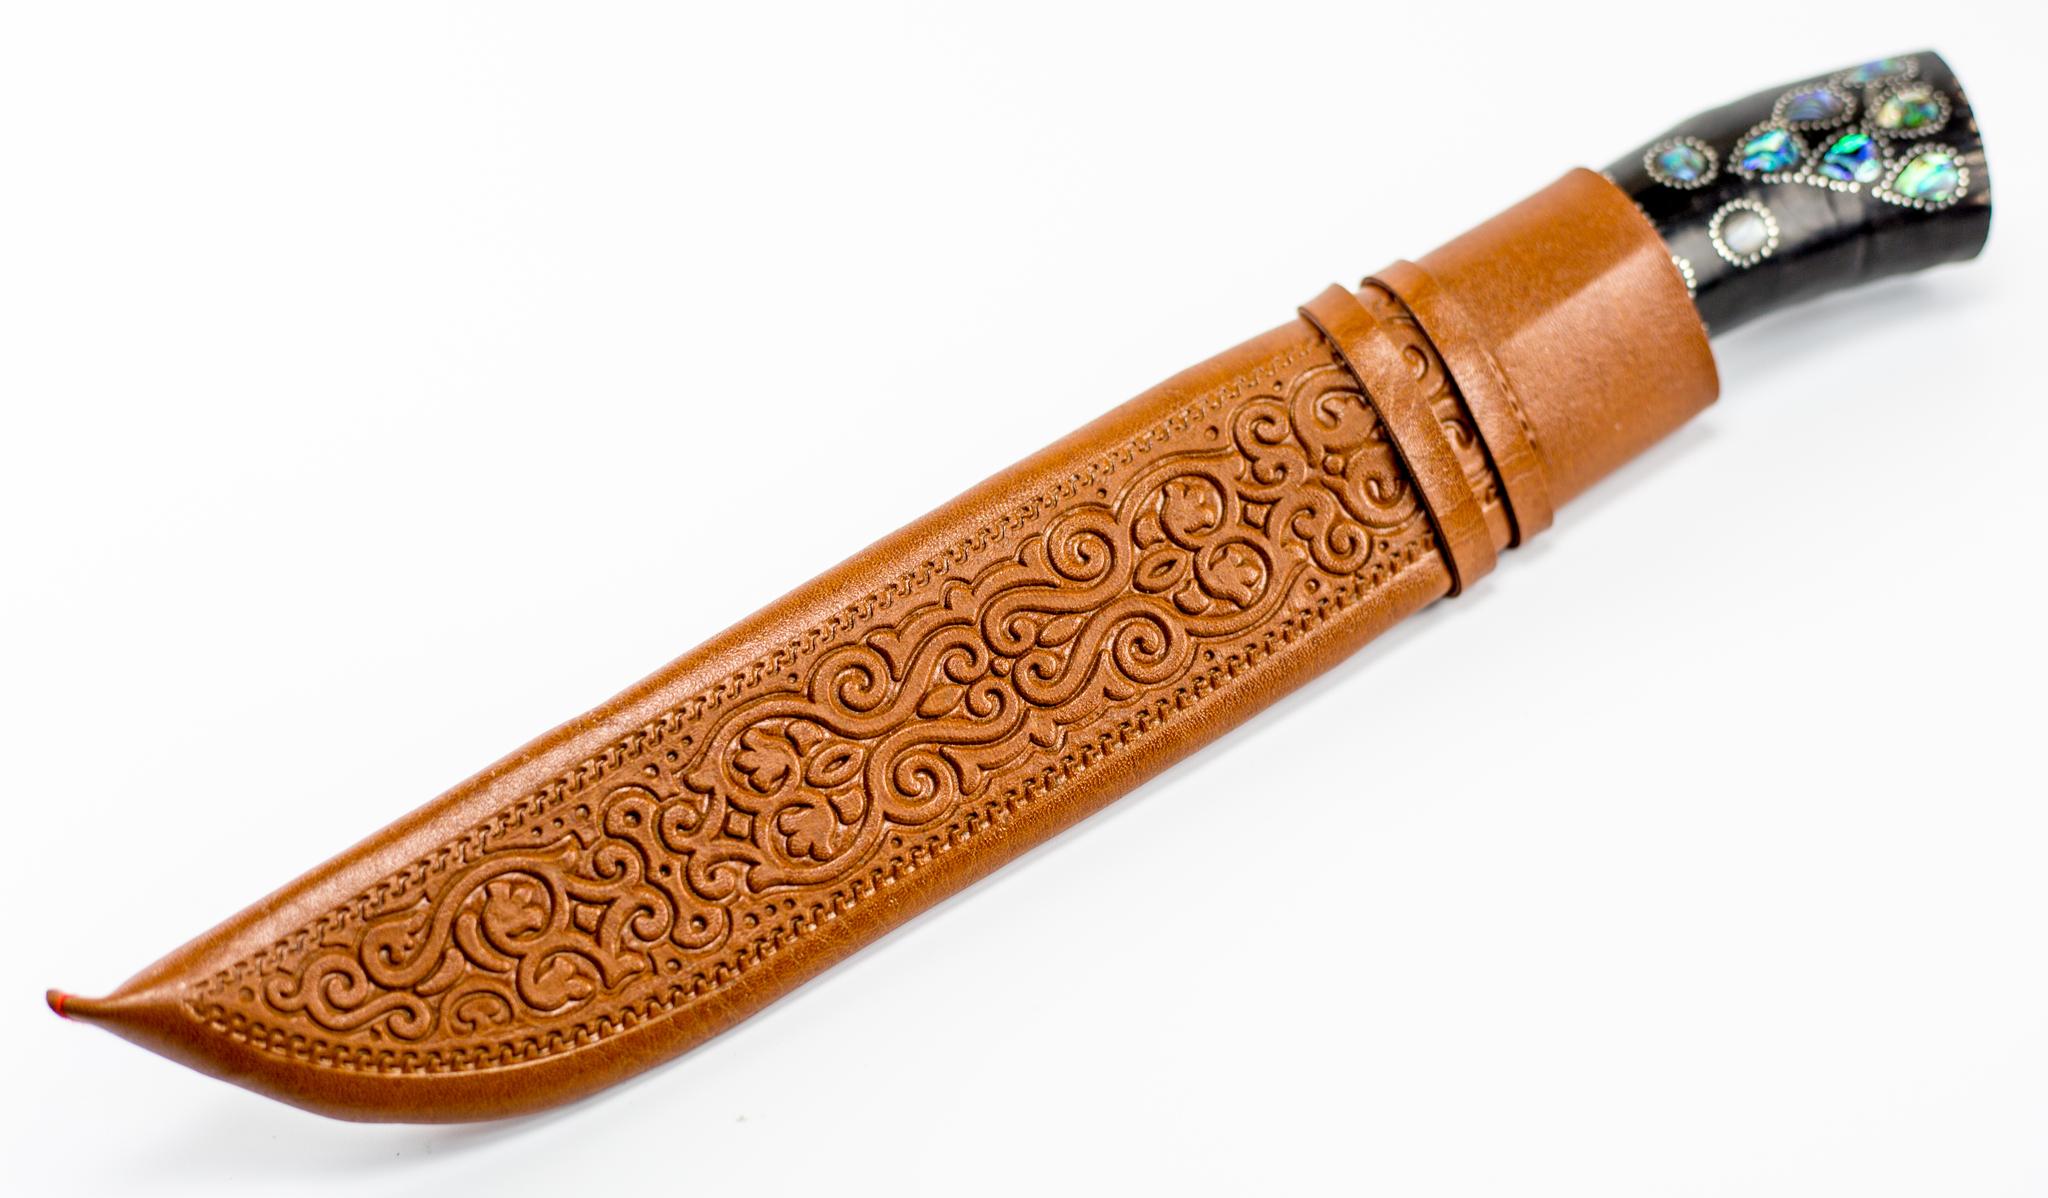 Фото 3 - Узбекский нож пчак Бекабад